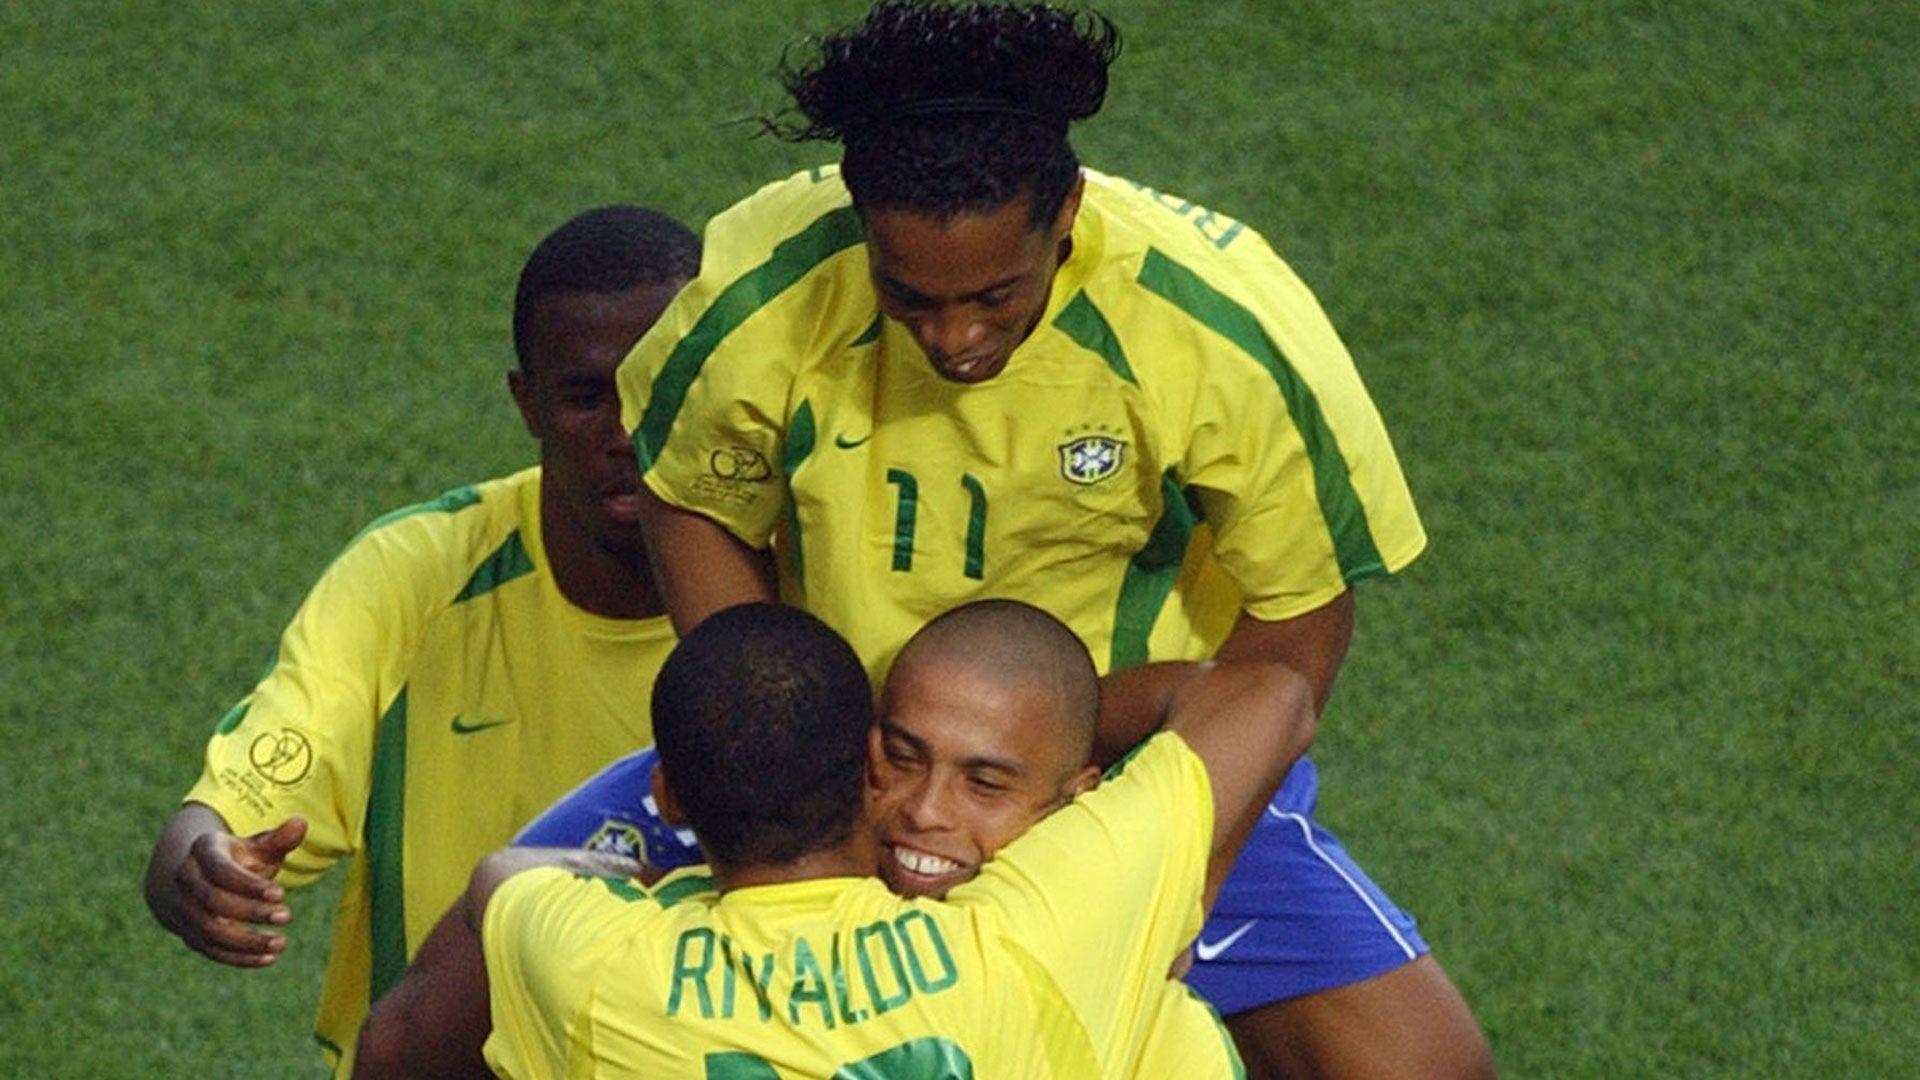 Ronaldo And Ronaldinho Wallpapers Wallpaper Cave